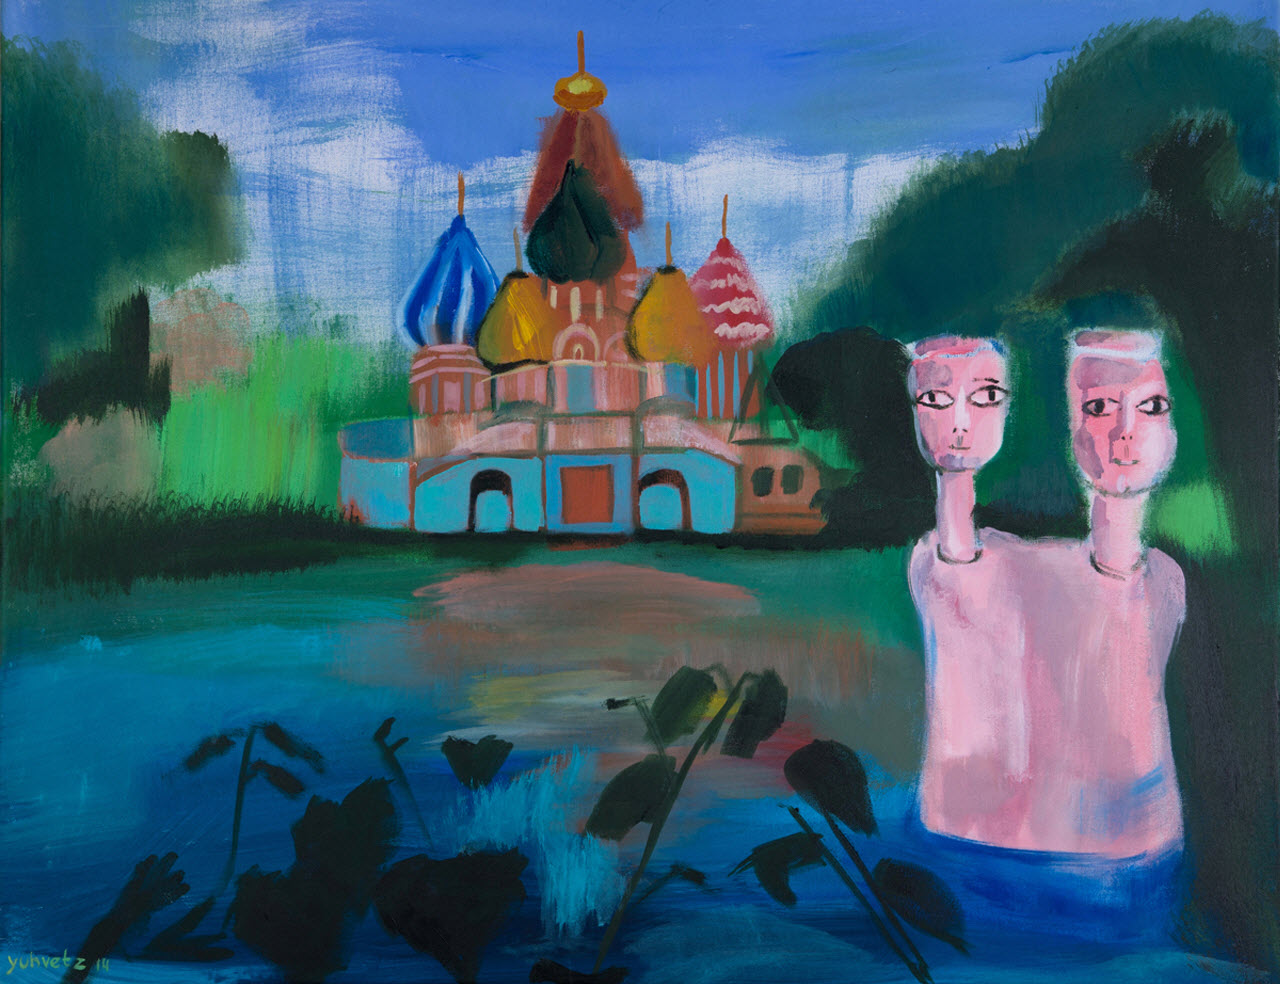 Twins | Acrylic on Canvas / 90x70cm / 2014